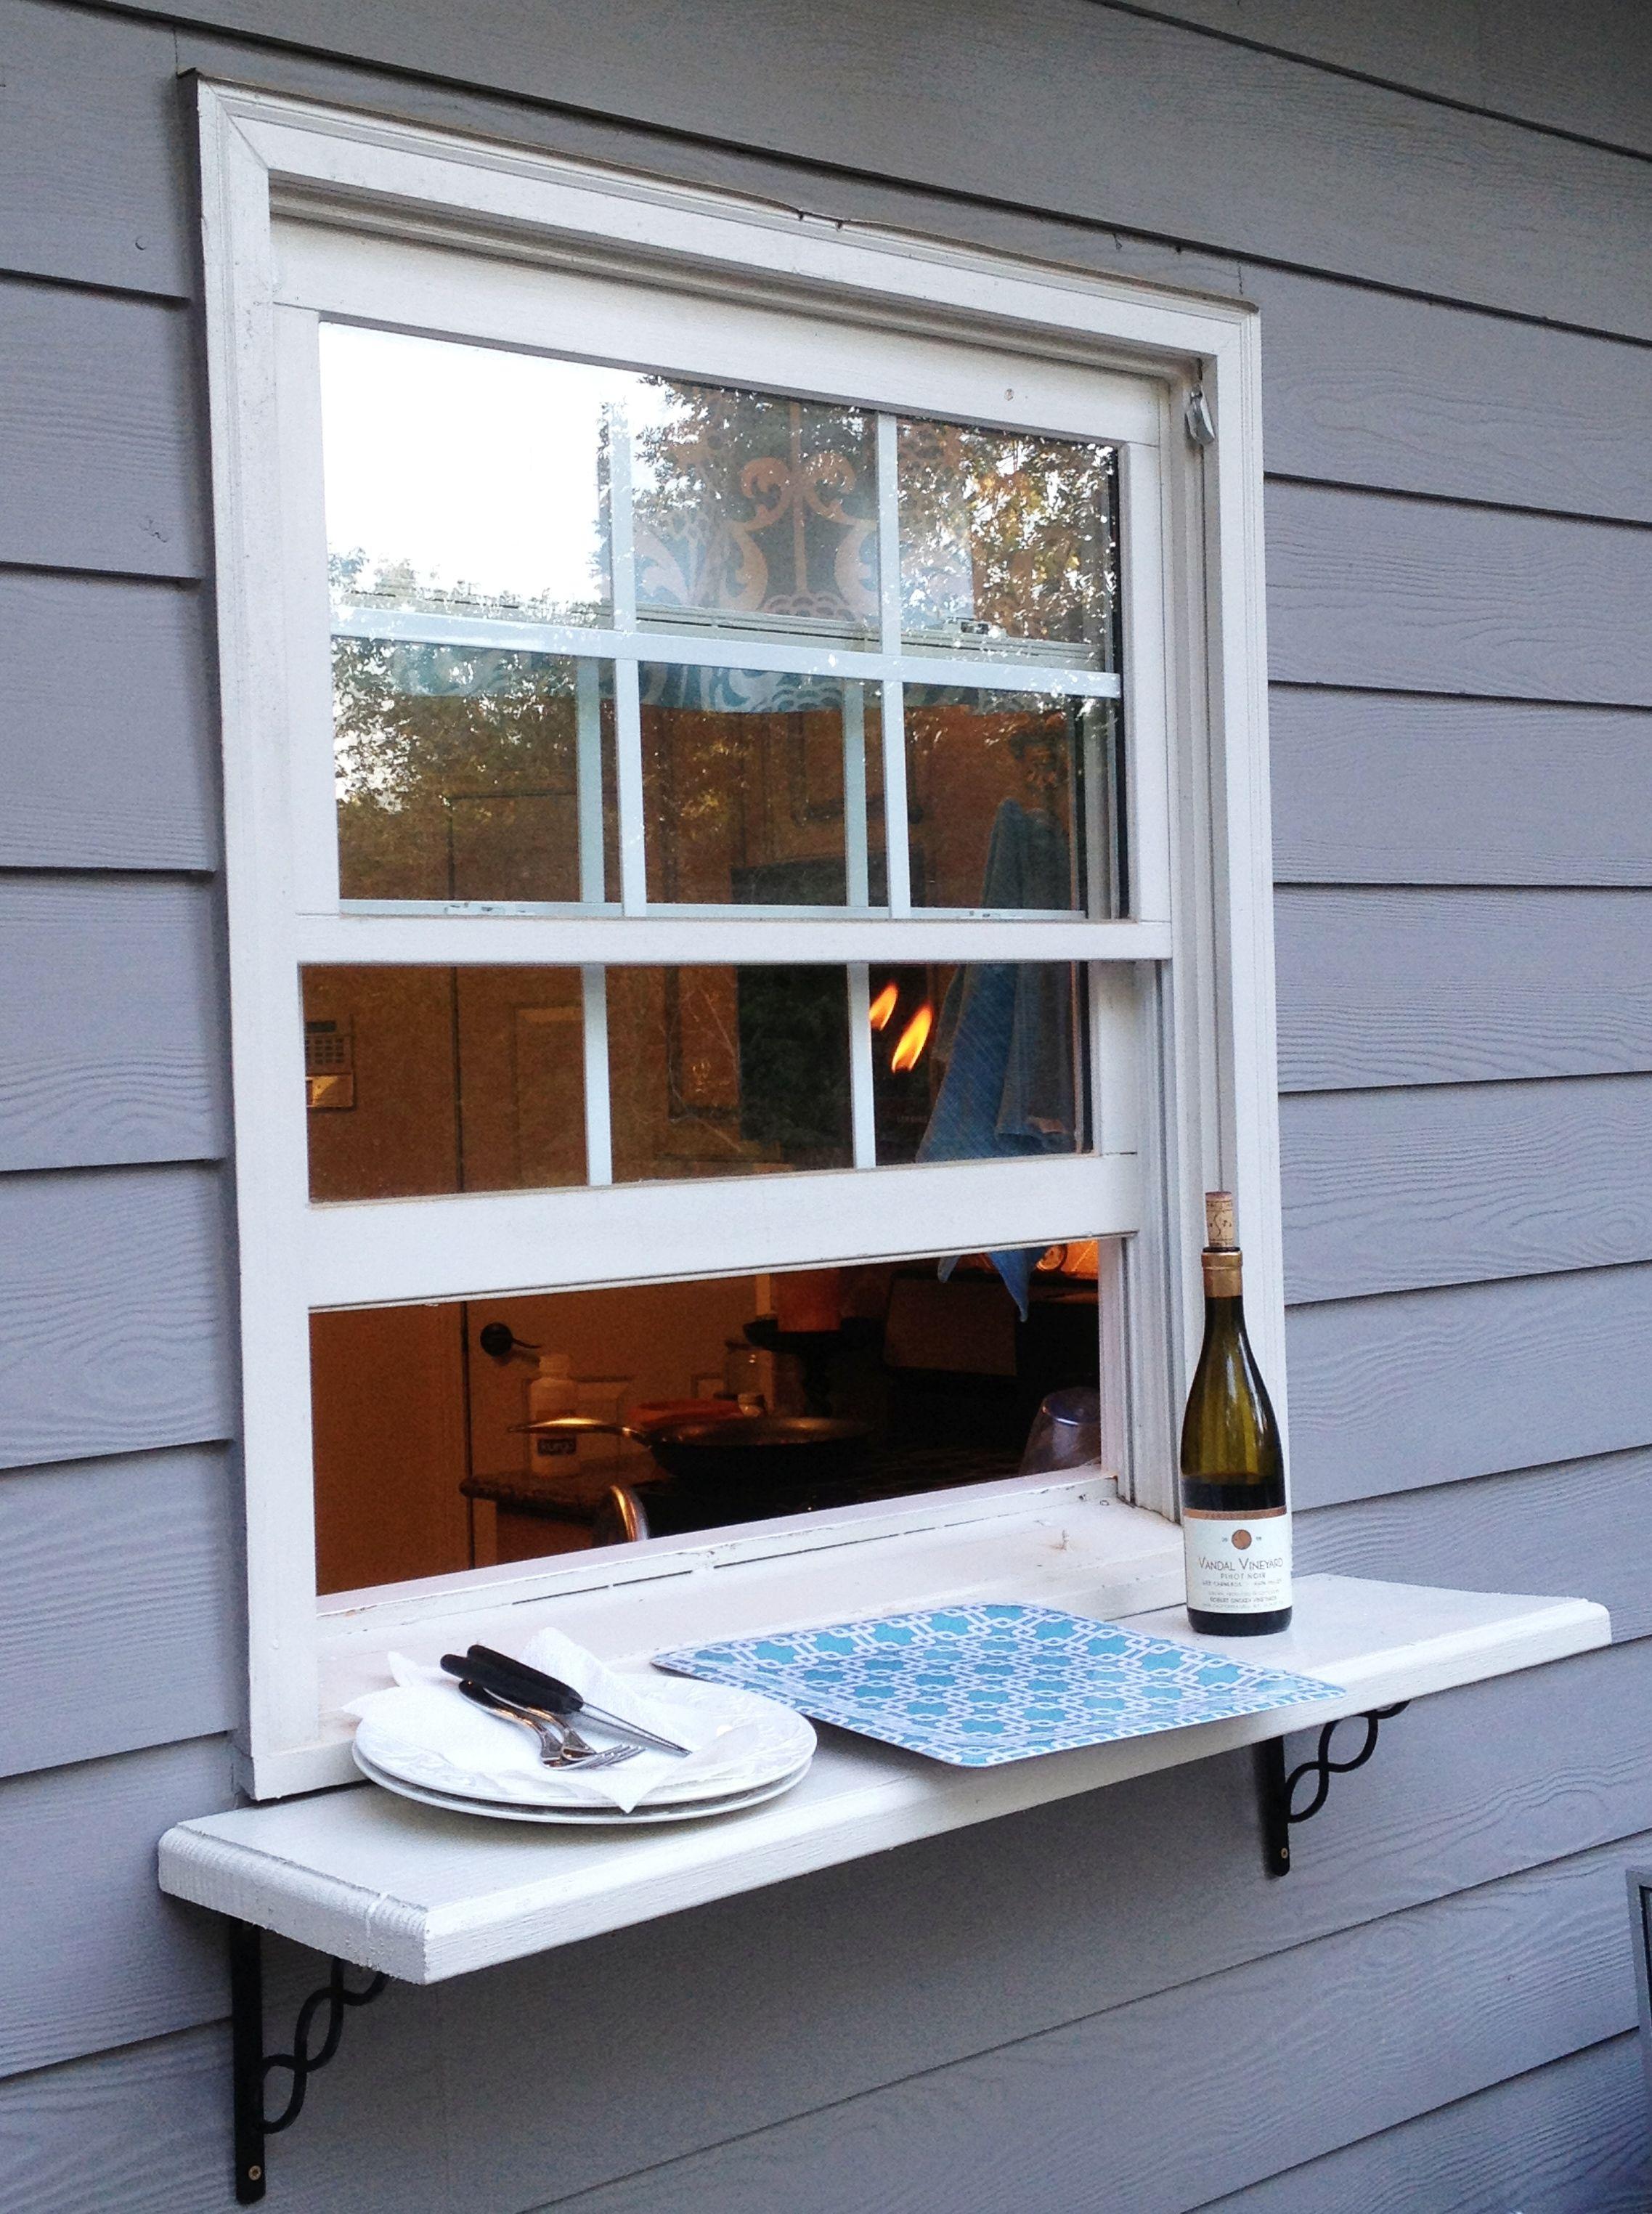 Kitchen servery window ideas  deck window shelf easy pass thru to the outside from kitchen